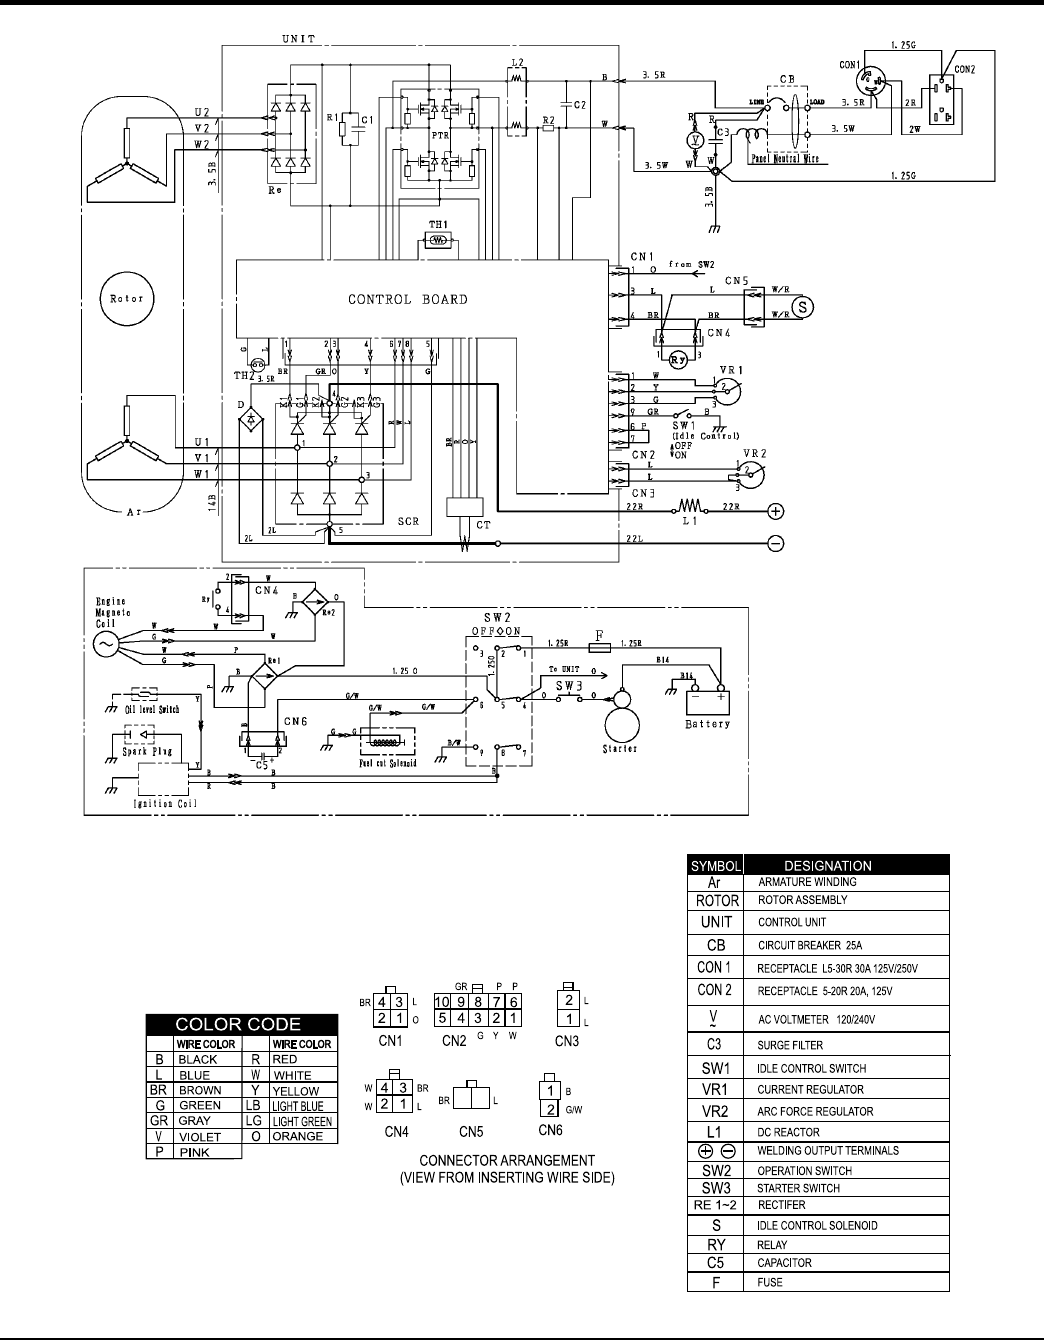 Generators And Welders Gaw180he Welder Series Rev 0 Manual Data Id Welding Generator Schematic Diagram Page 38 Gaw180 Operation Parts 06 02 15